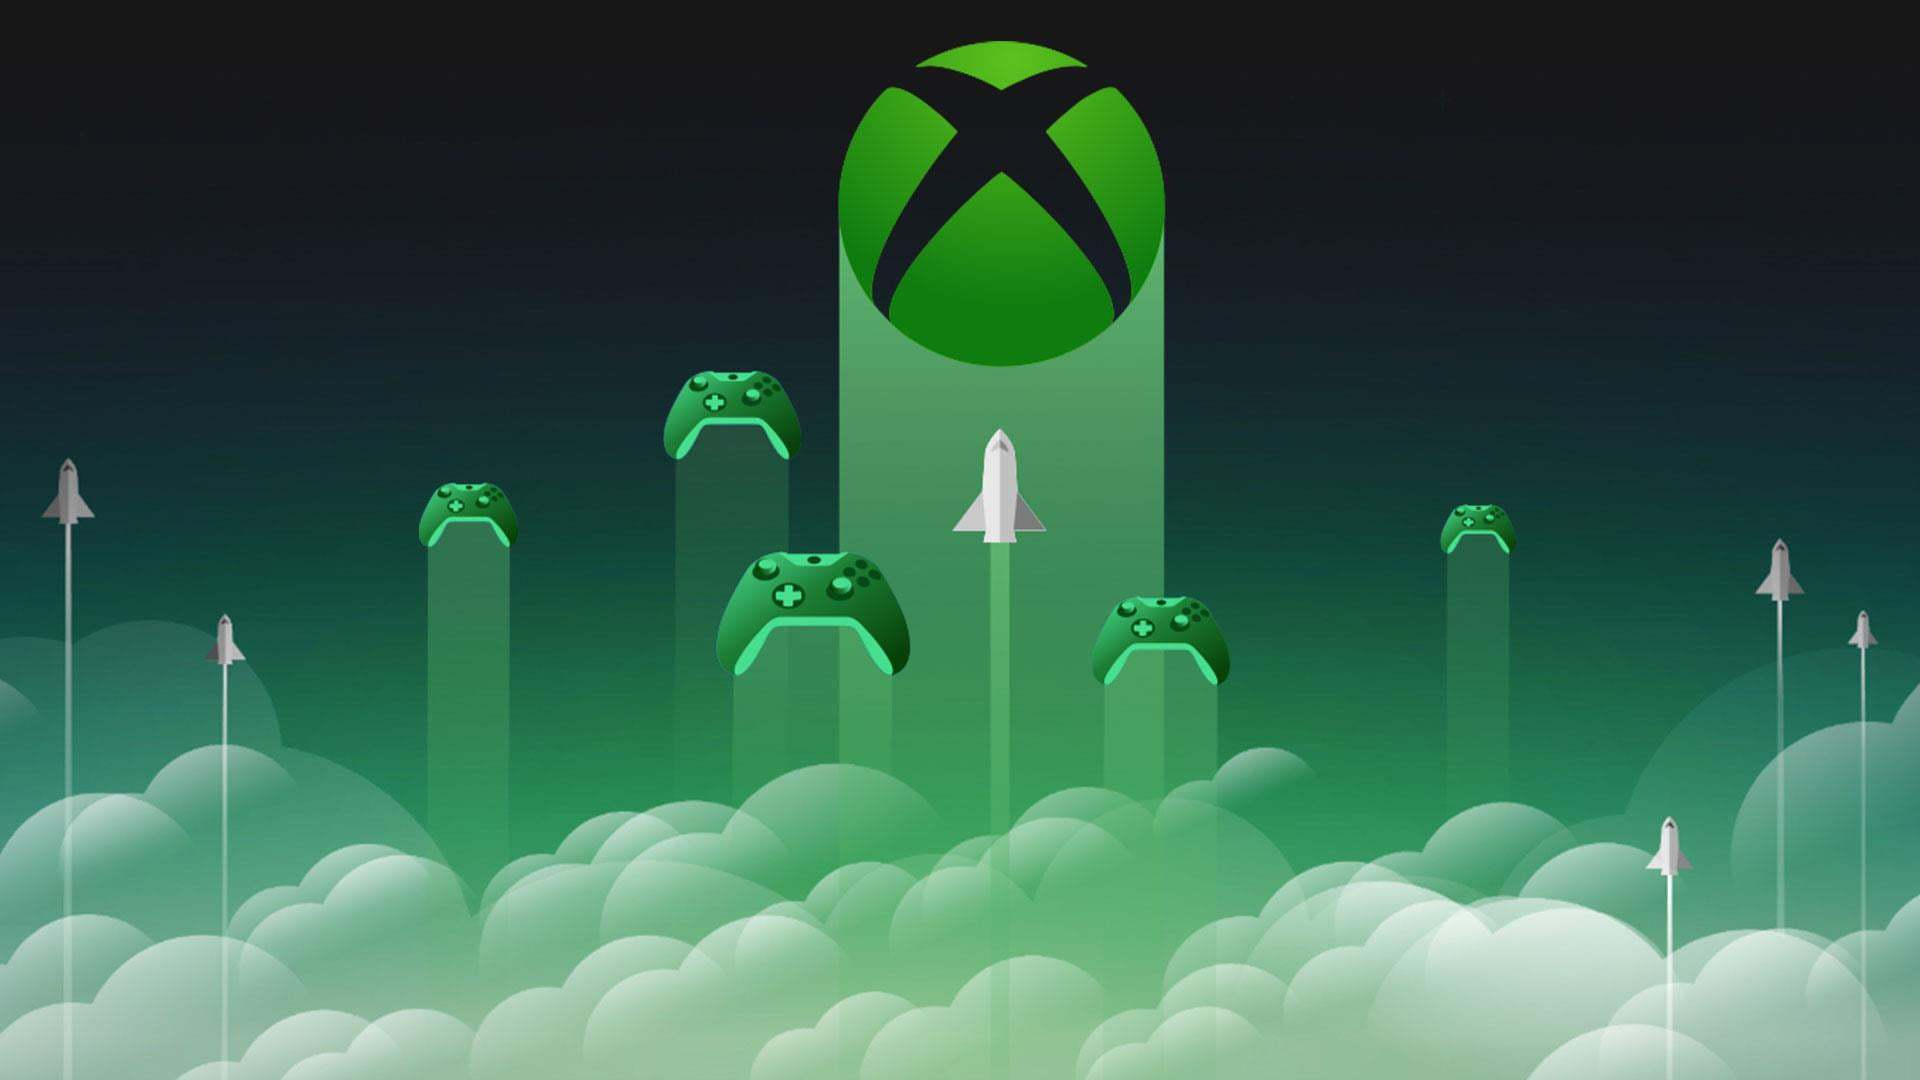 Xbox Game Streaming : l'application xCloud pour Windows se montre - Xboxygen